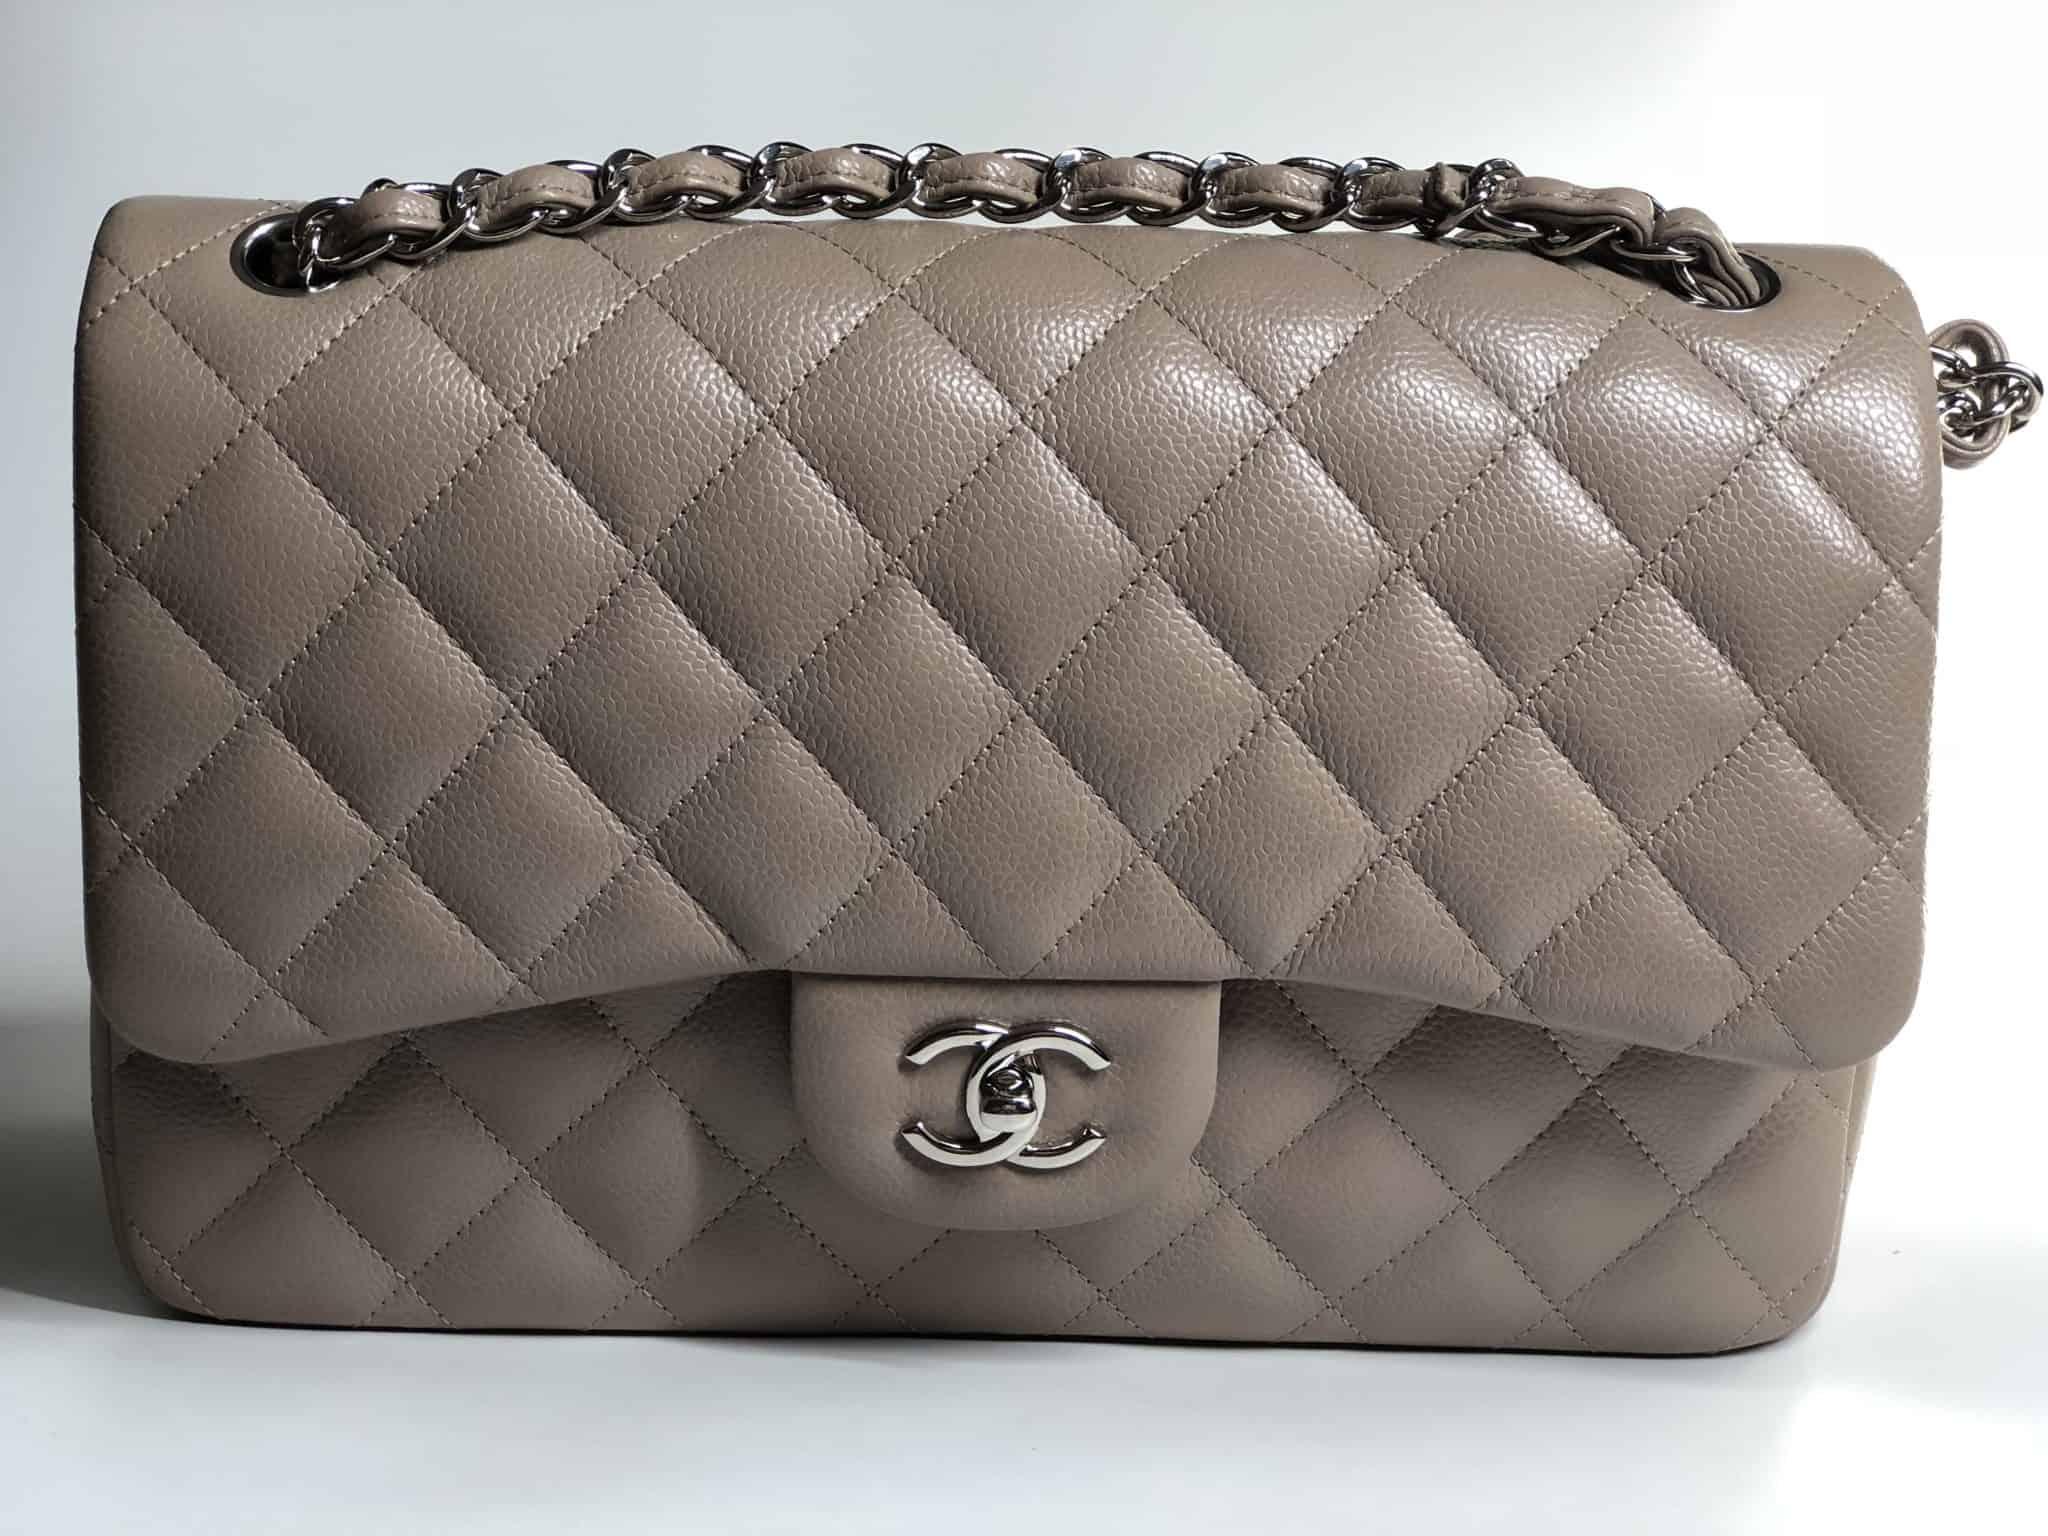 d56ebd13e815 Chanel 14B Beige Taupe Jumbo Double Flap Bag brand new kept unused ...